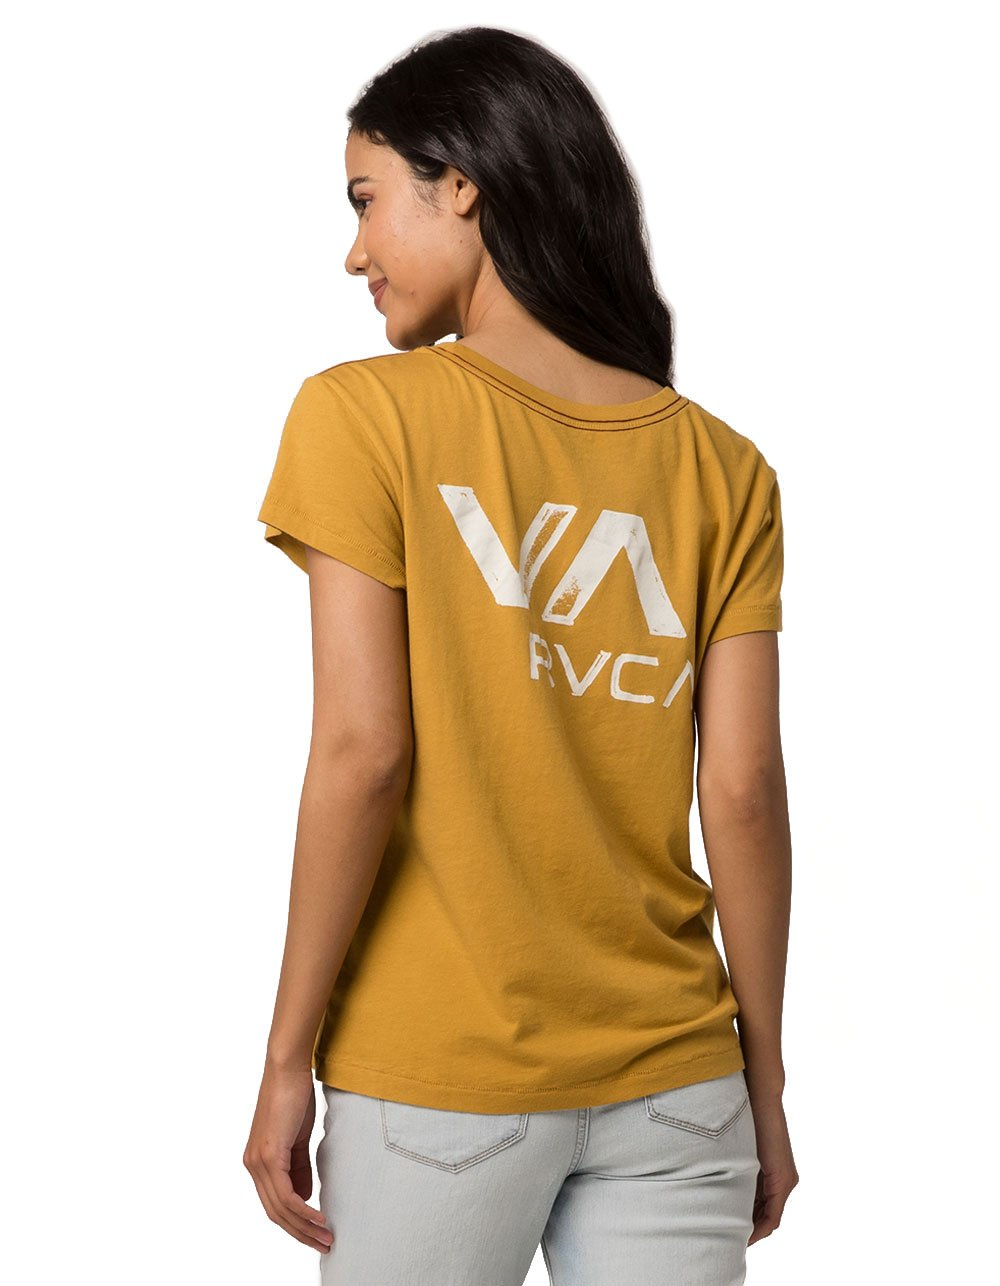 RVCA VA Ink Pocket Tee, Yellow, Large